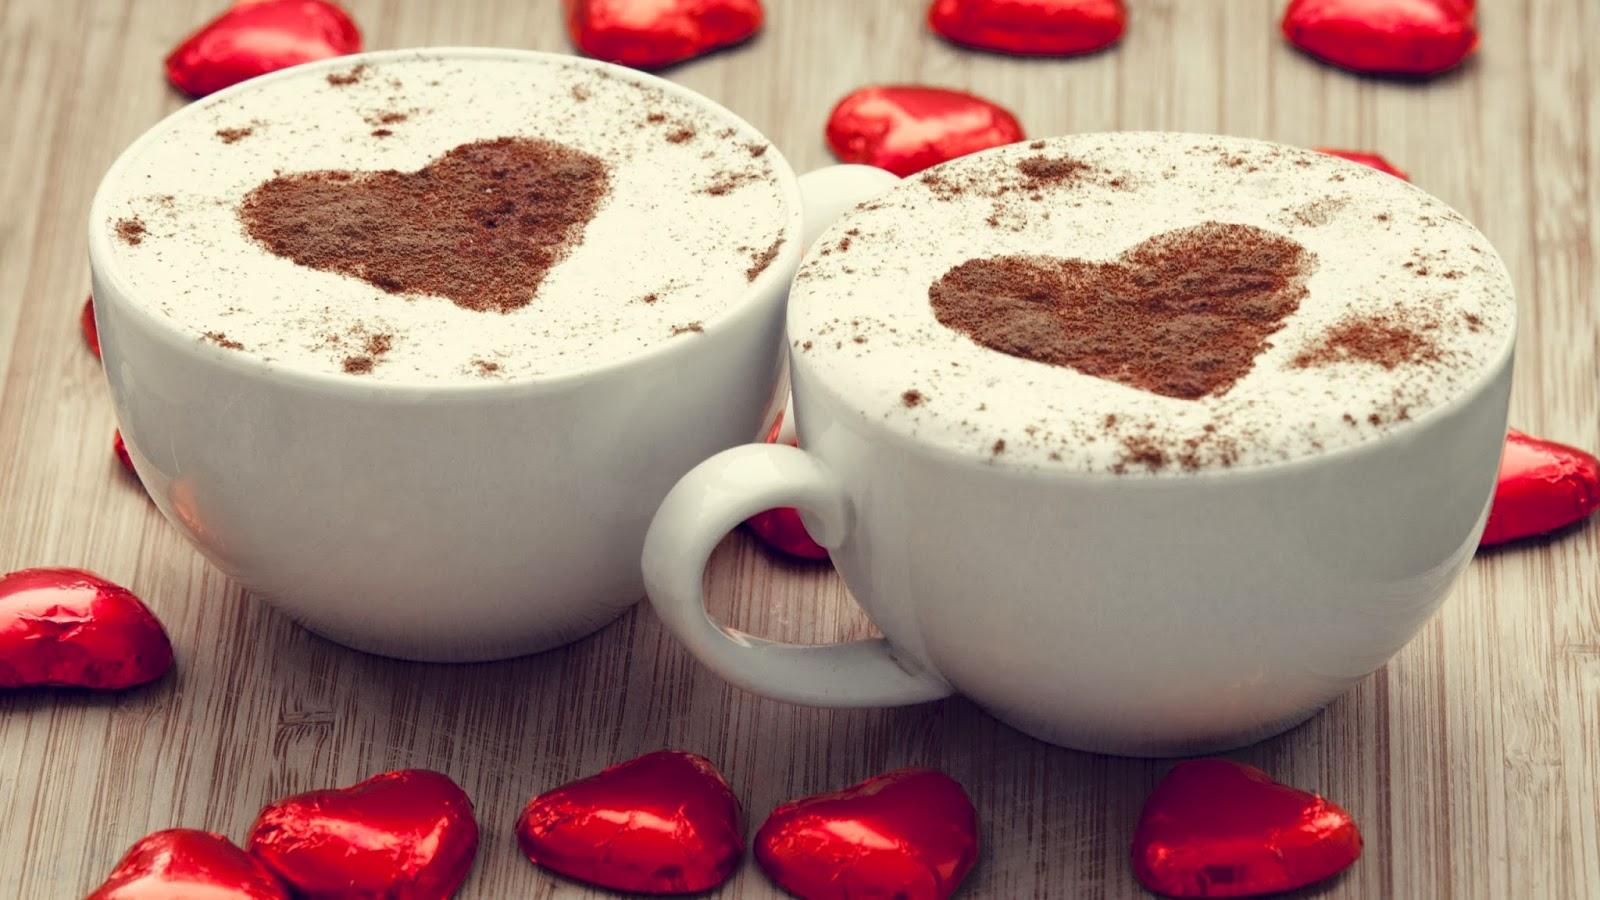 Coffee Lovers Love Hd Wallpapers: صور عن الأمل والتفاؤل بالحياة 2019 Photos Of Hope &happiness